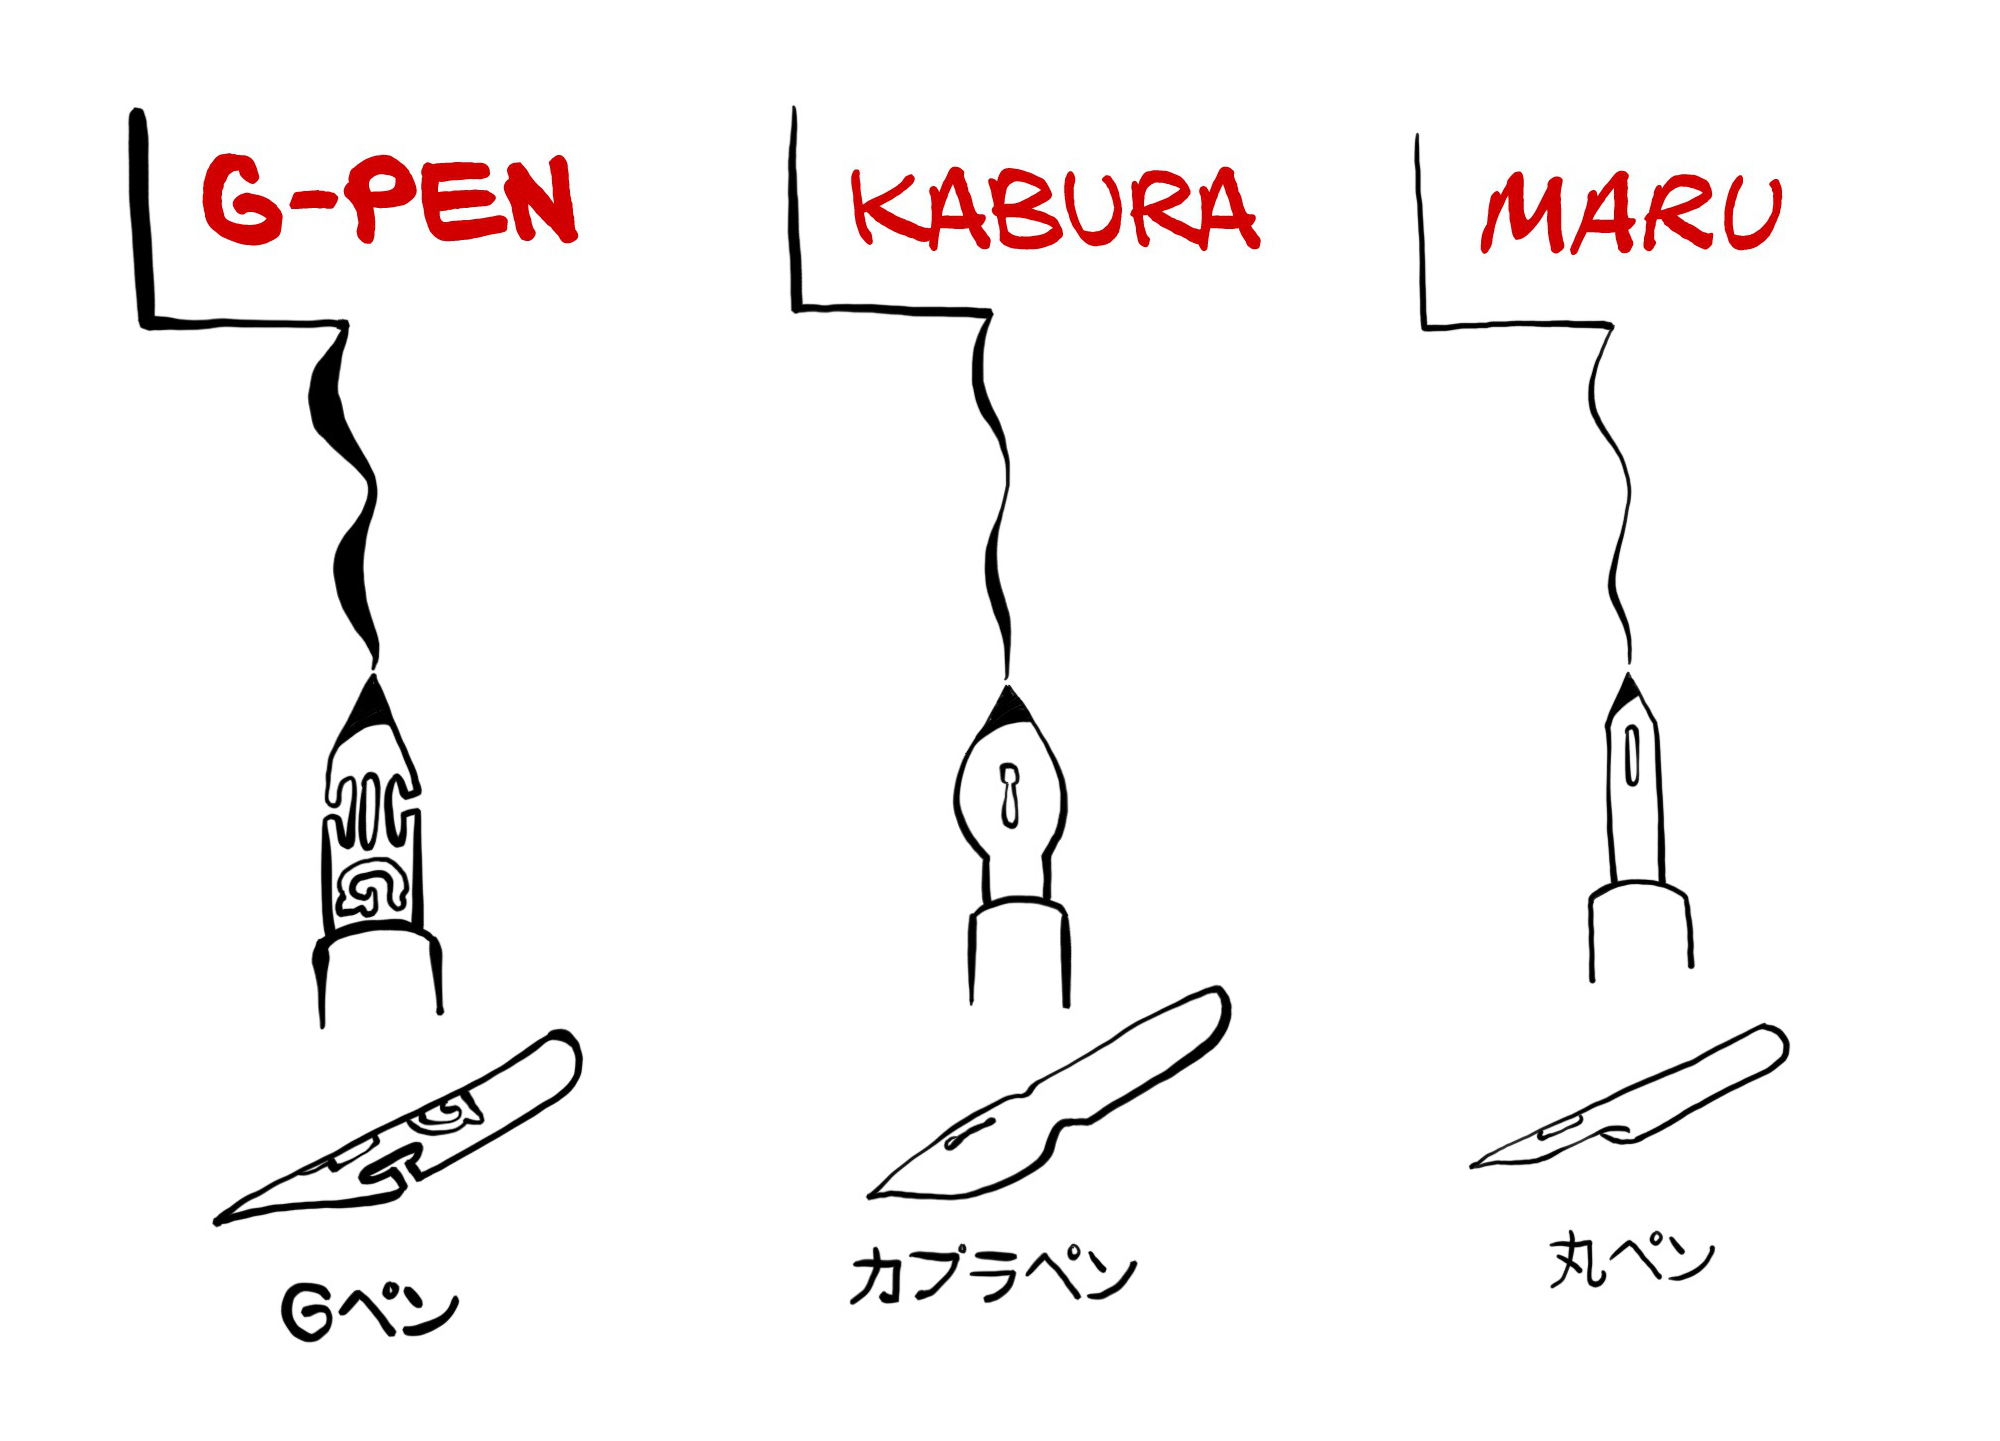 Georg's MANGA INK & ASIAN PAINT Brushes